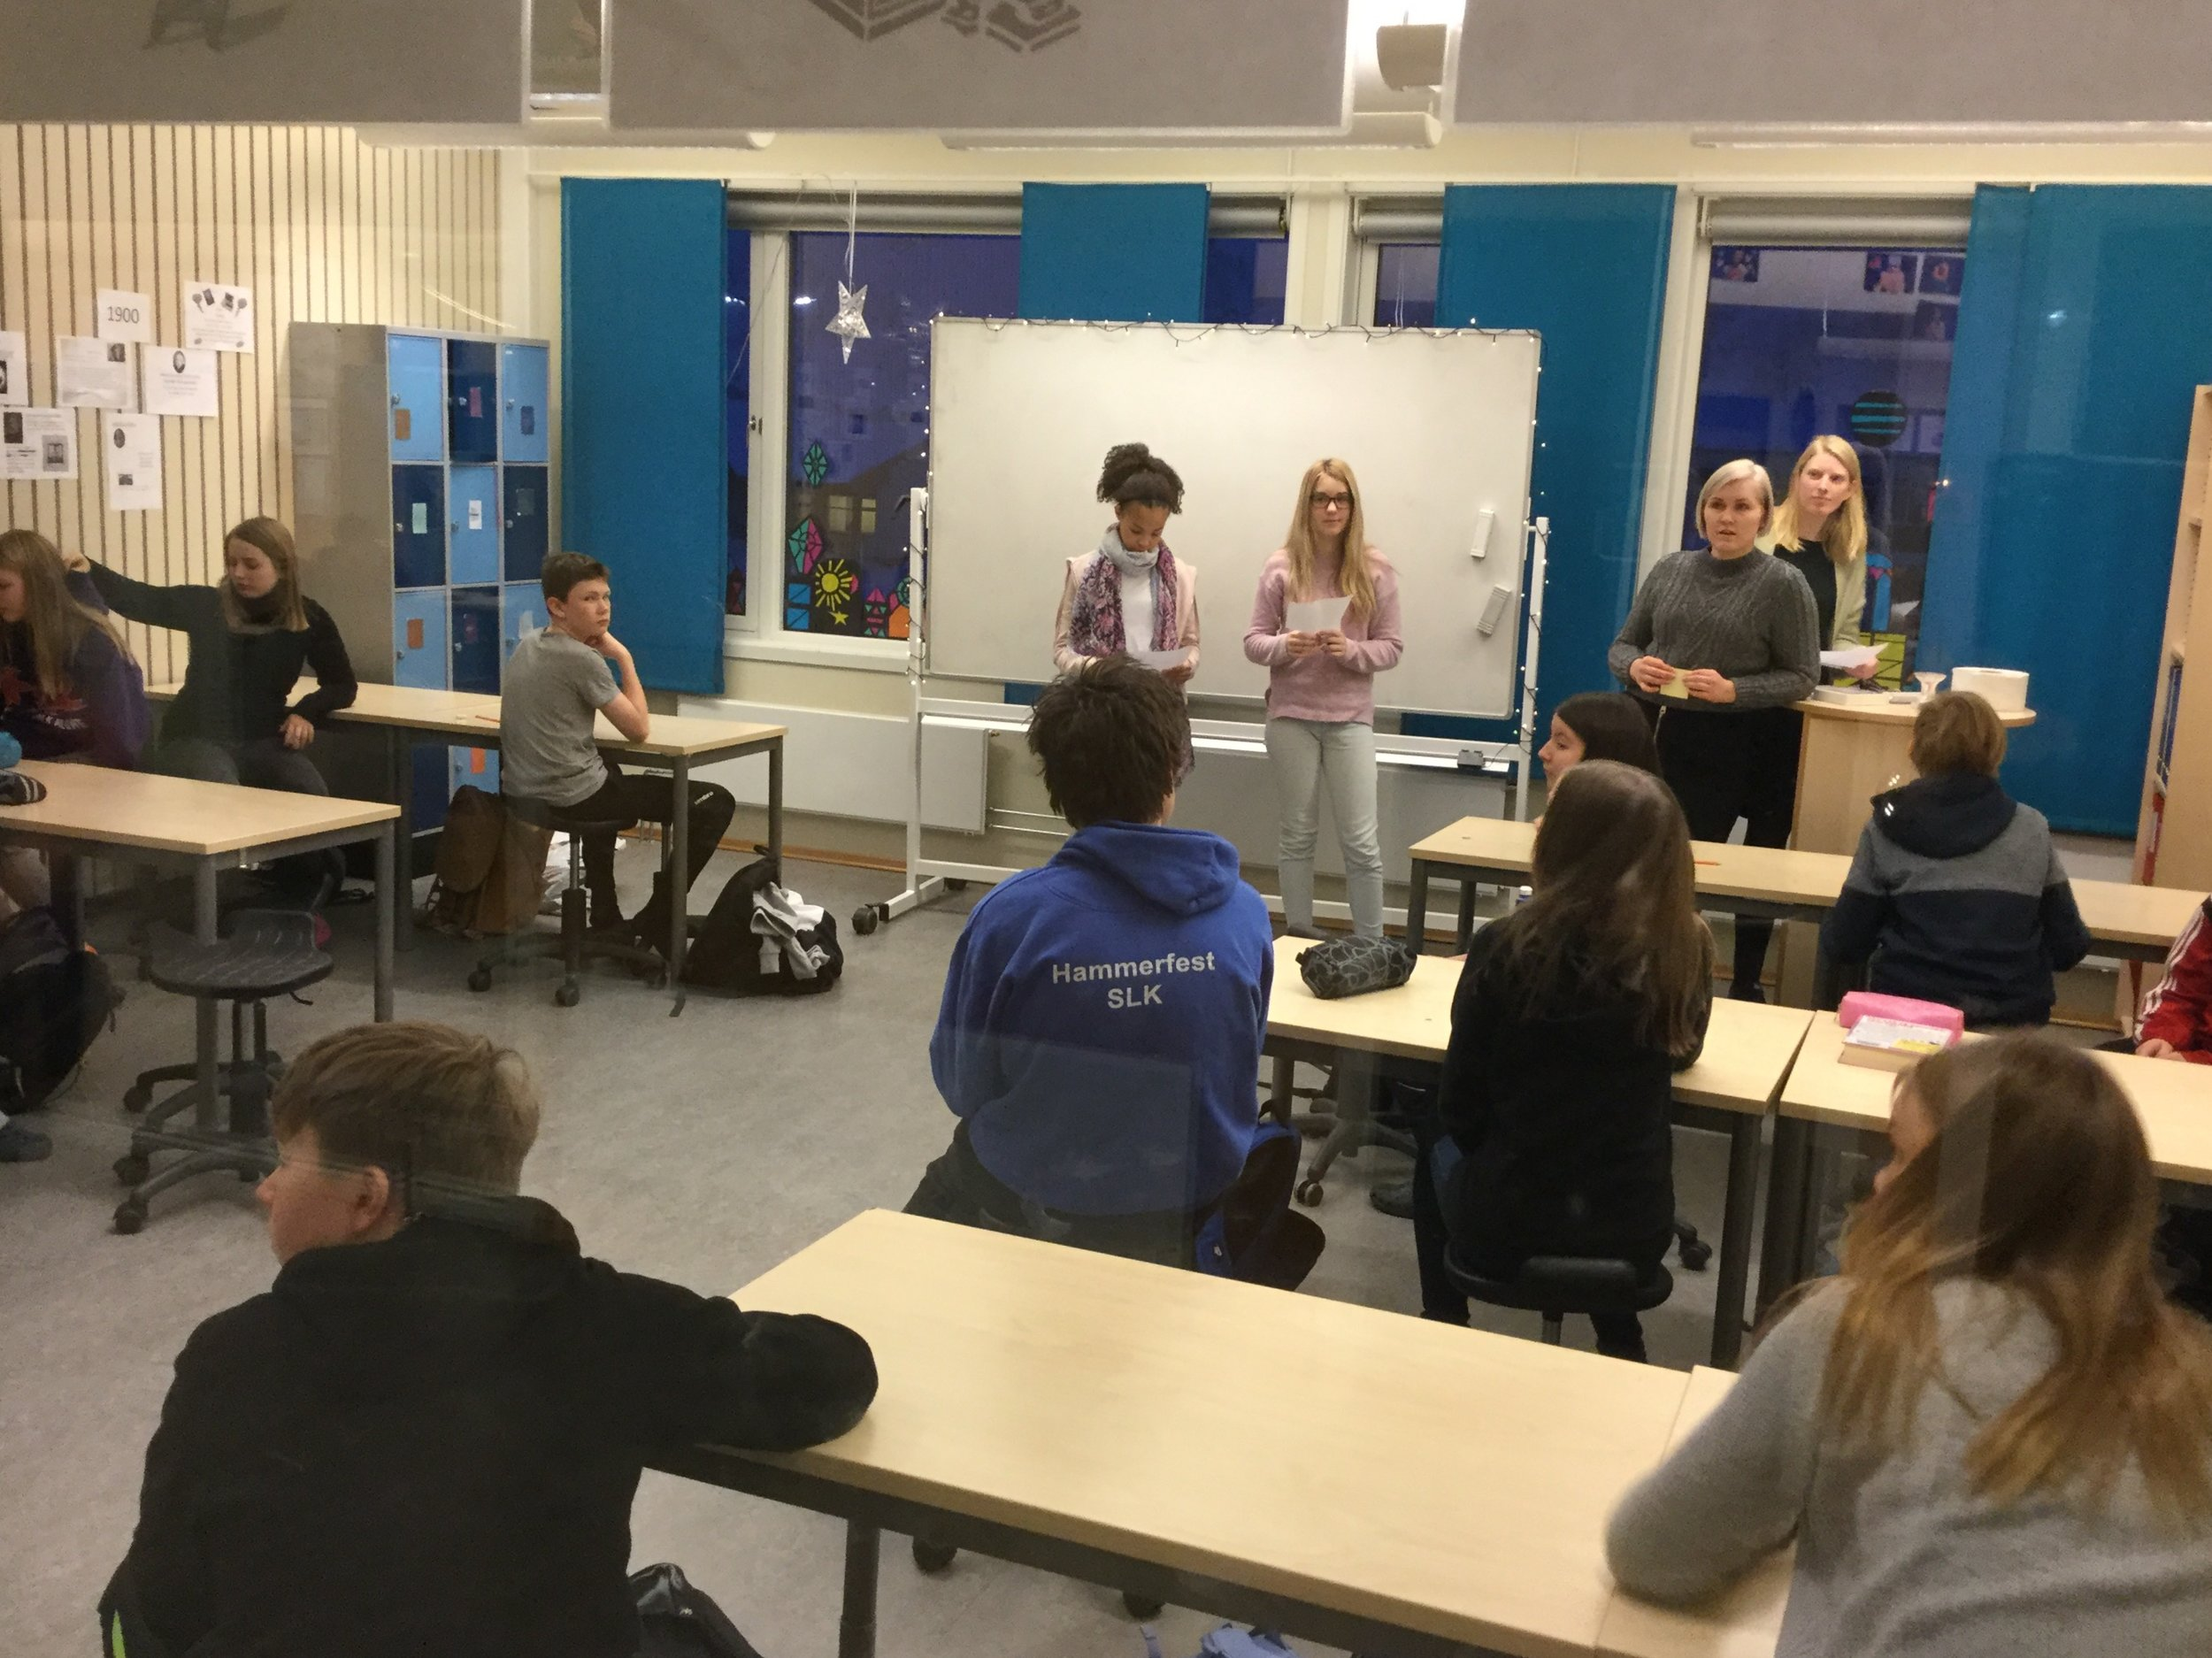 Students giving an oral presentation. Fjordtun skole.